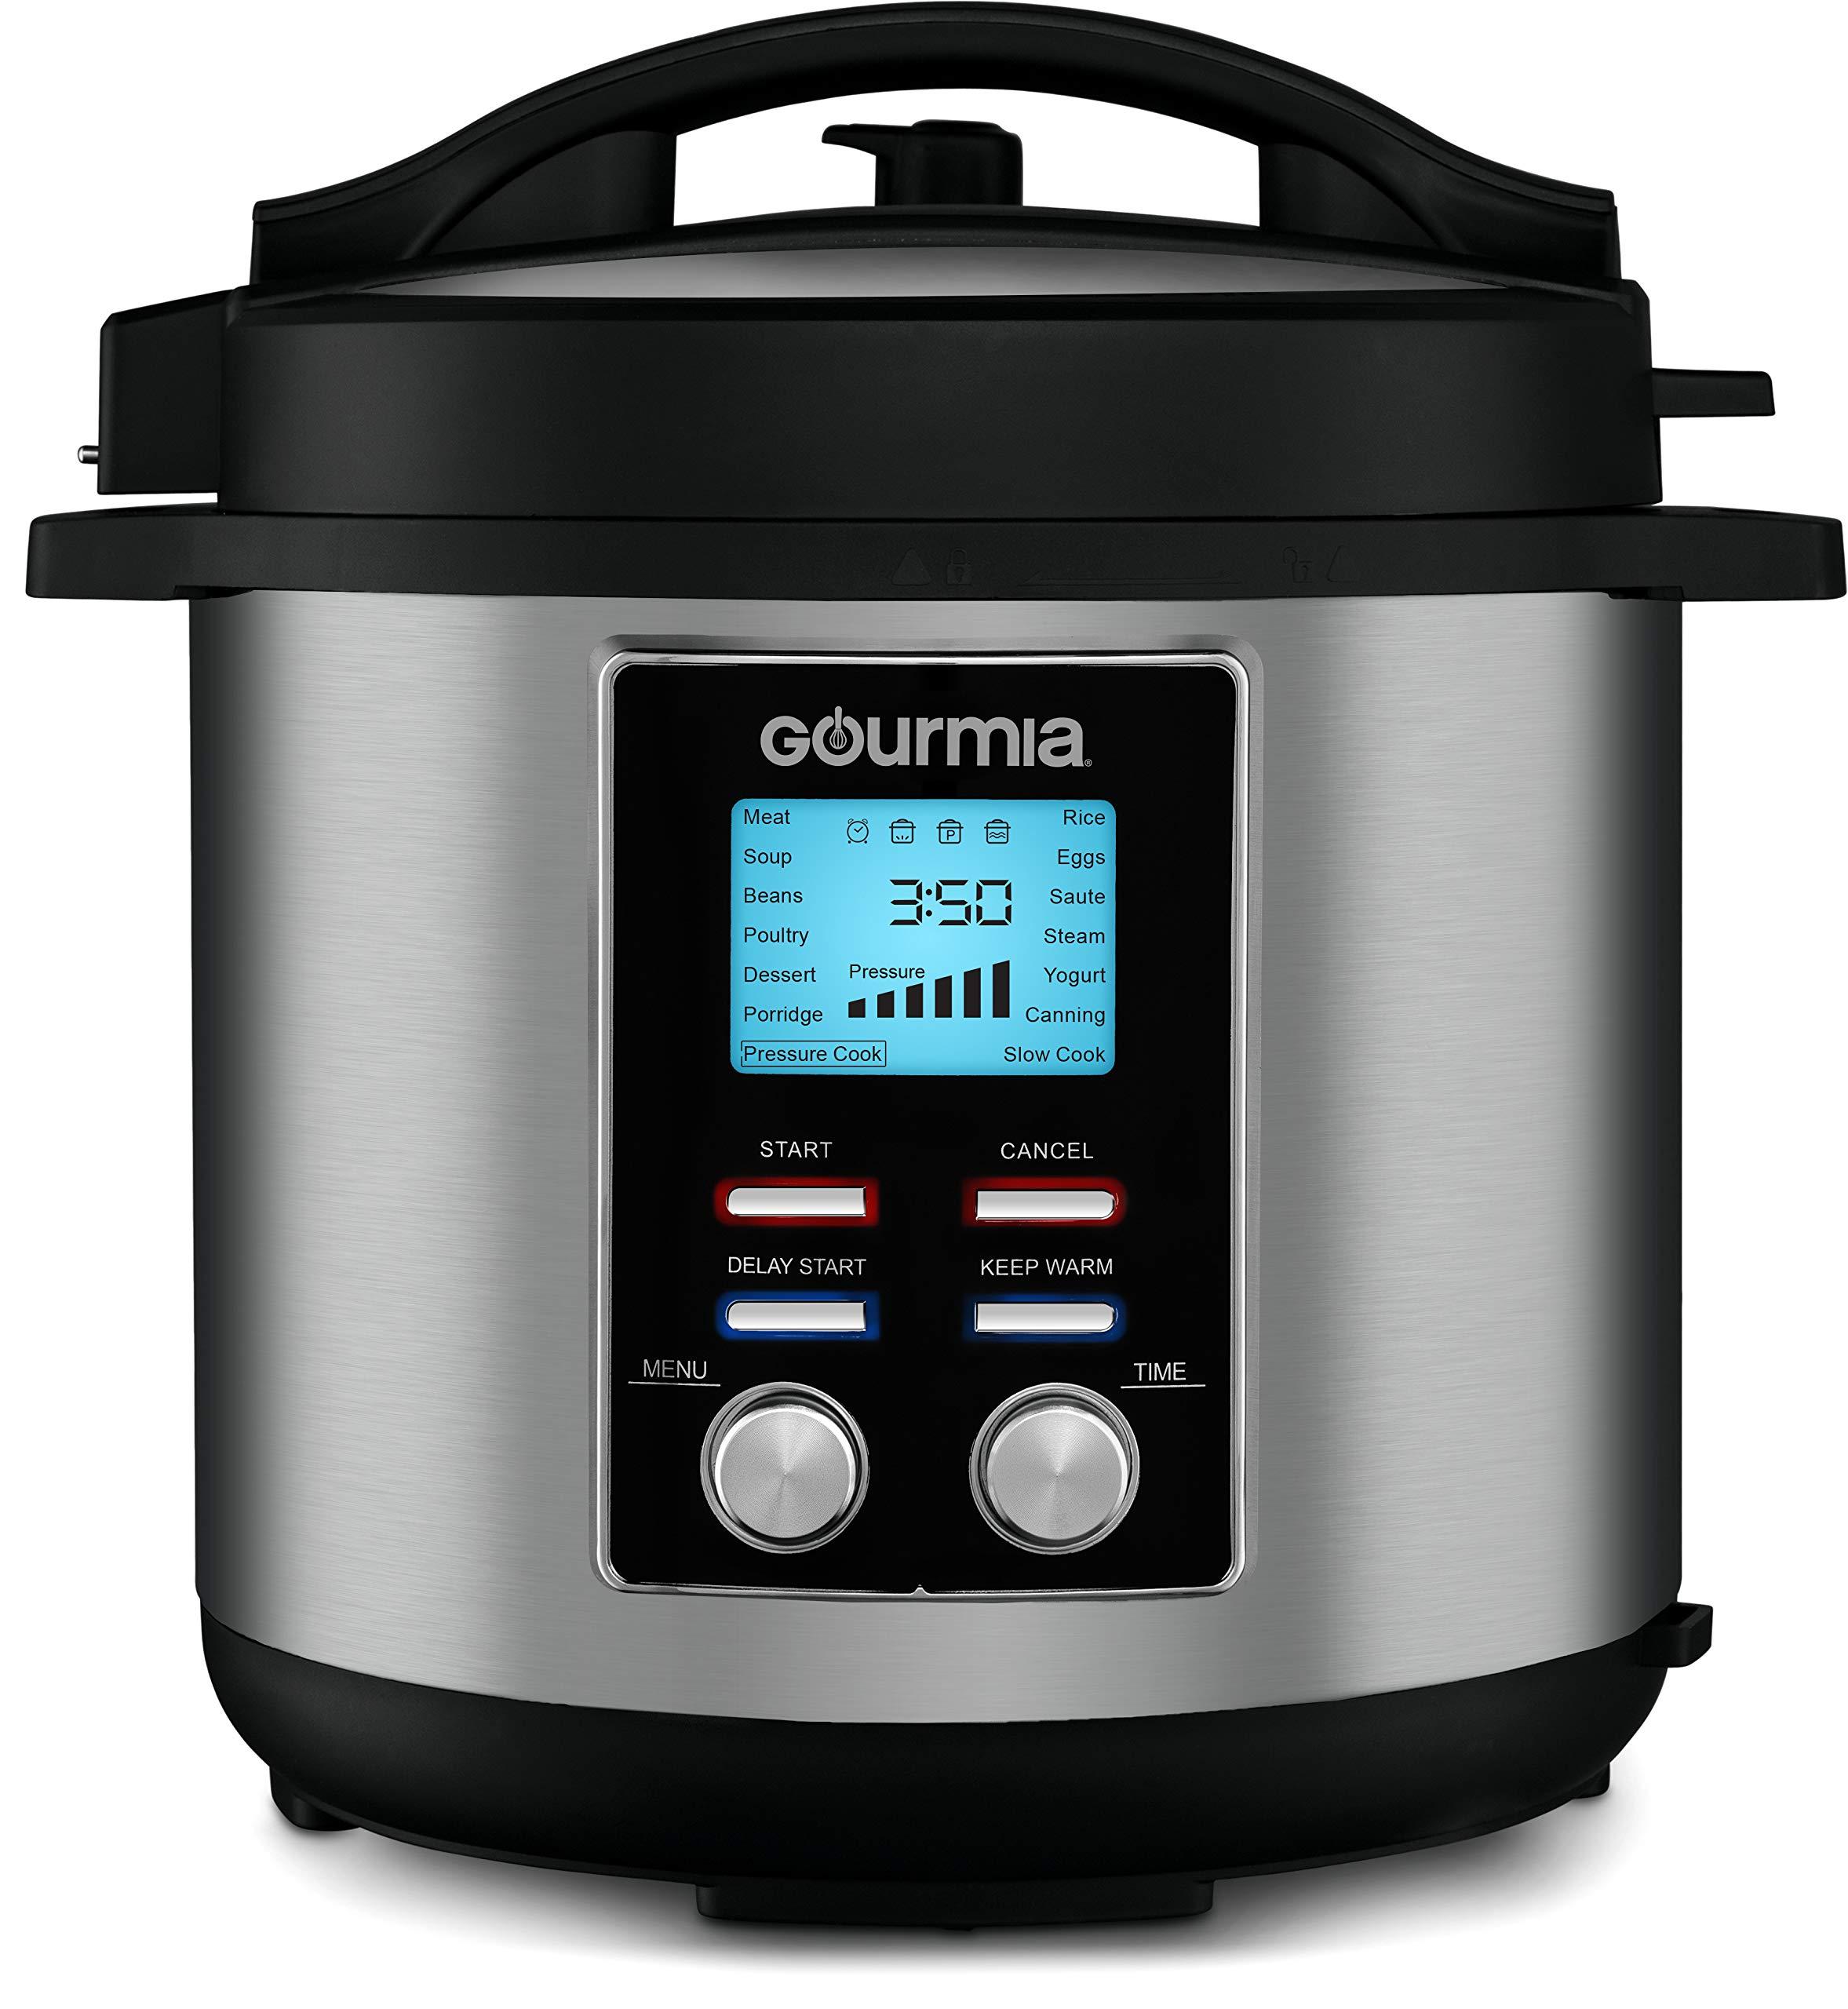 Gourmia GPC855 8 Qt Digital SmartPot Multi-Function Pressure Cooker | 15 Cook Modes | Removable Nonstick Pot | 24-Hour Delay Timer | Automatic Keep Warm | LCD Display | Pressure Sensor Lid Lock